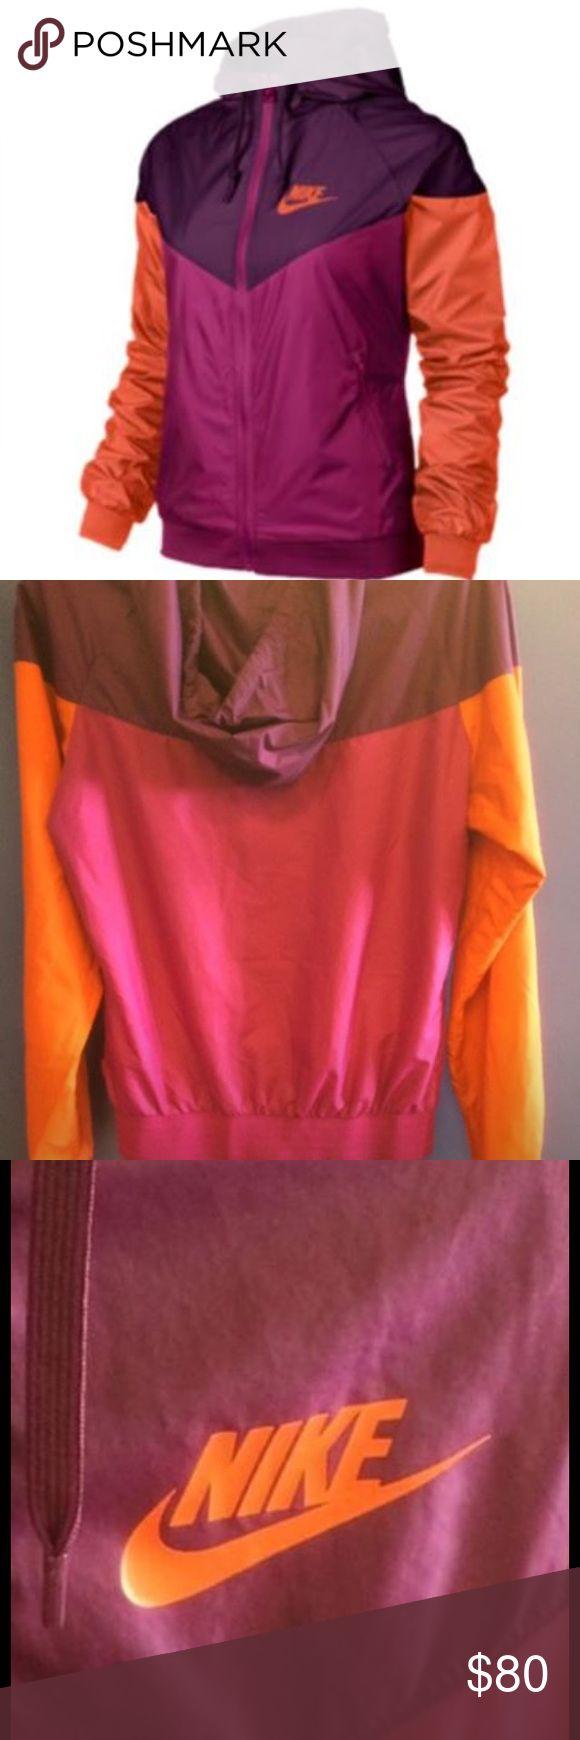 Authentic-Nike windbreaker SIZE SMALL Nike Windrunner Jacket - Women's - Sport Fuchsia/Mulberry/Electro orange 🍊 Nike Jackets & Coats